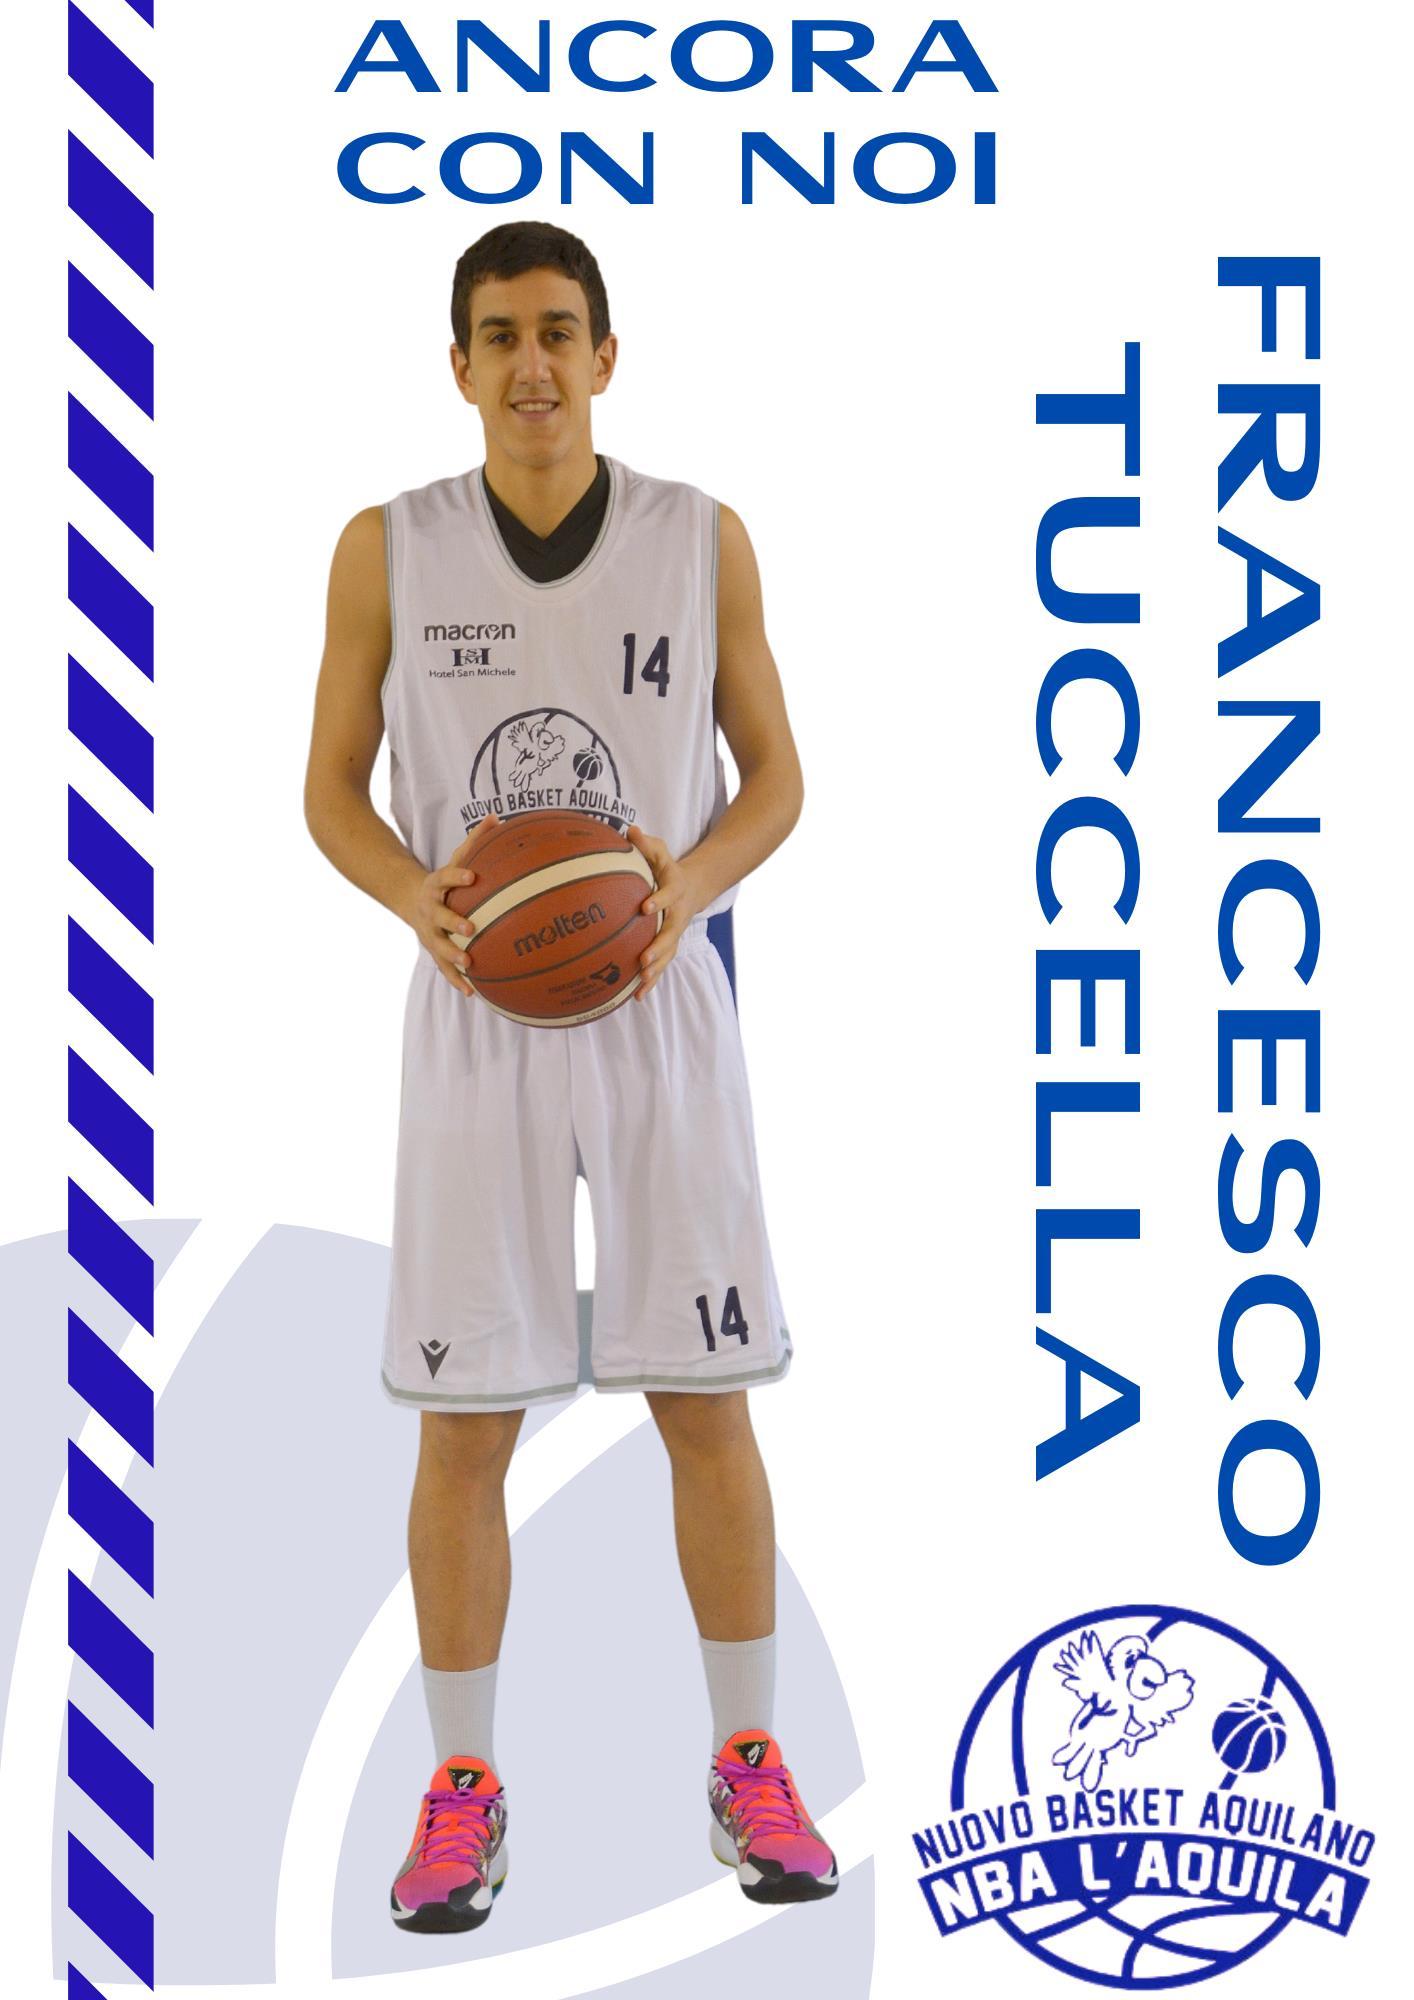 Franceco Tuccella